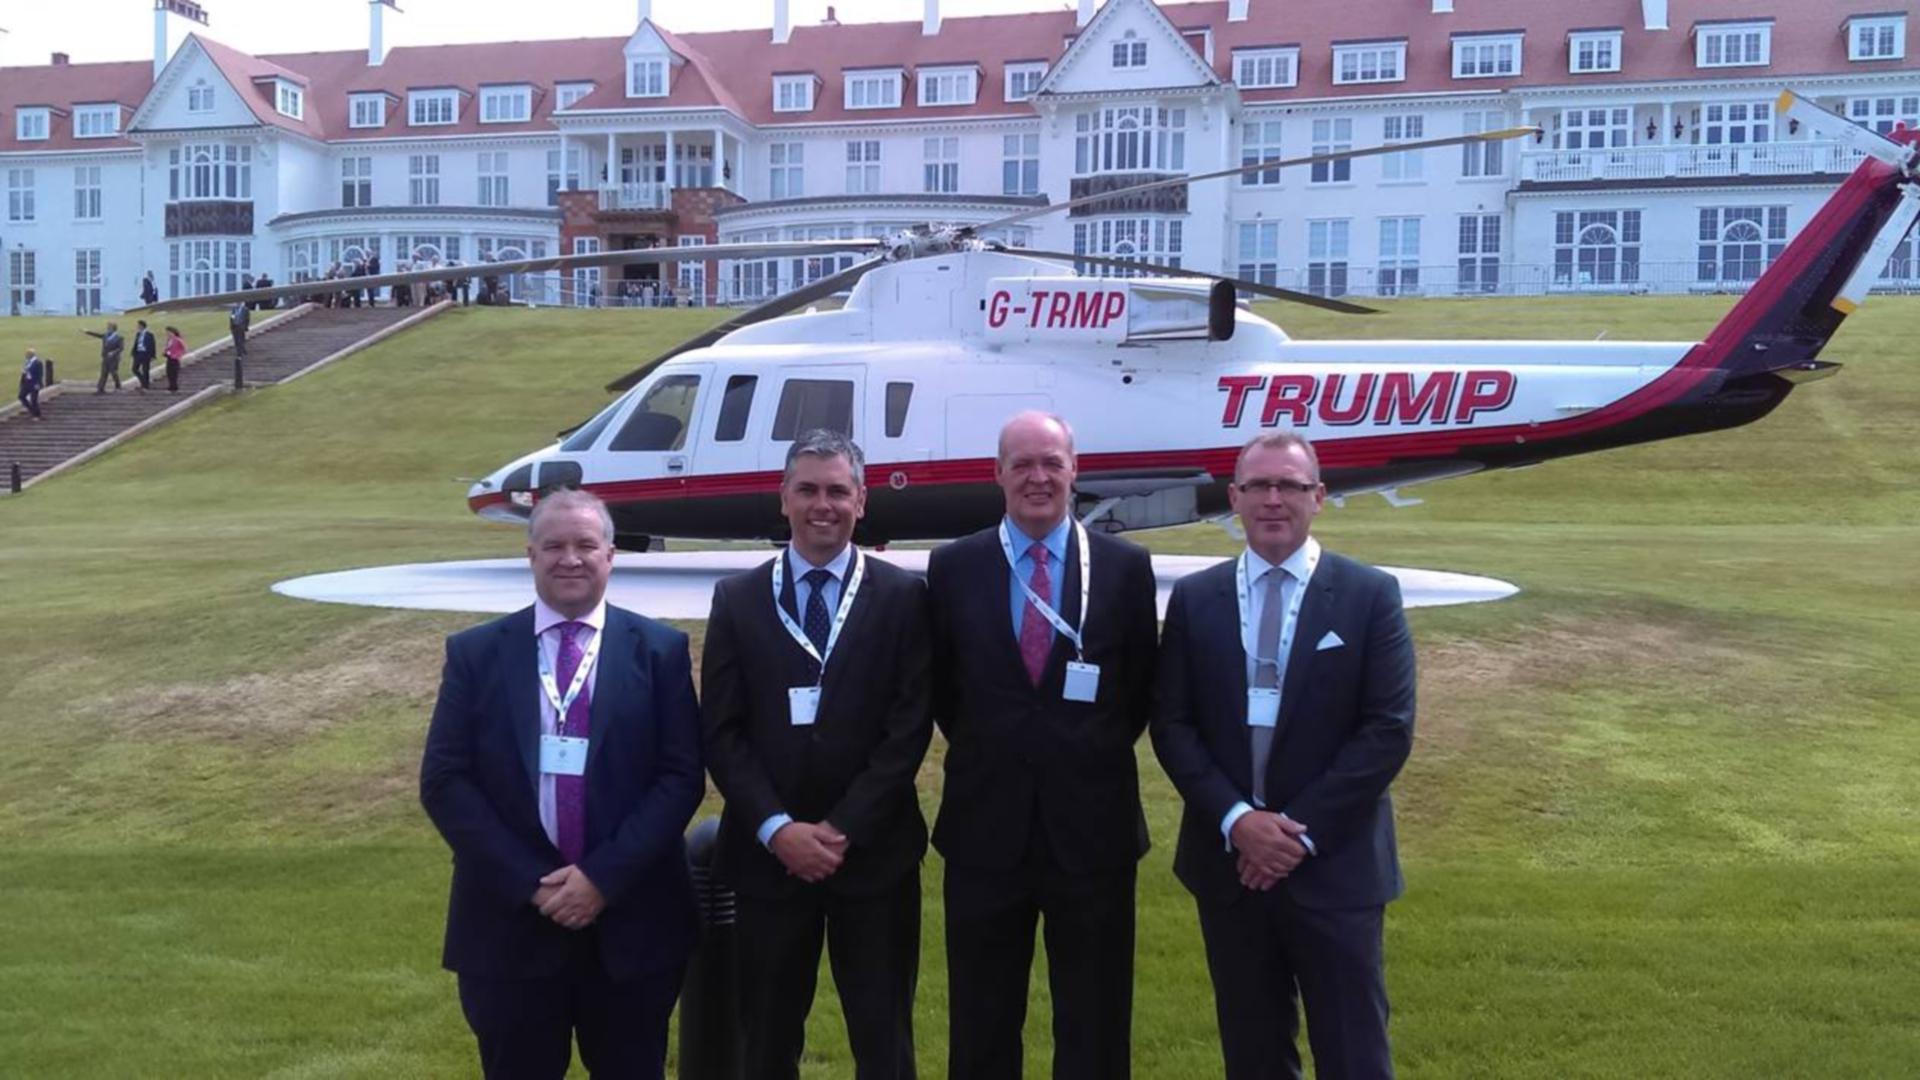 Hardies' Trump Turnberry team of Martin Cabe, Danny McArthur, Derek Ferrier and Craig Smart.